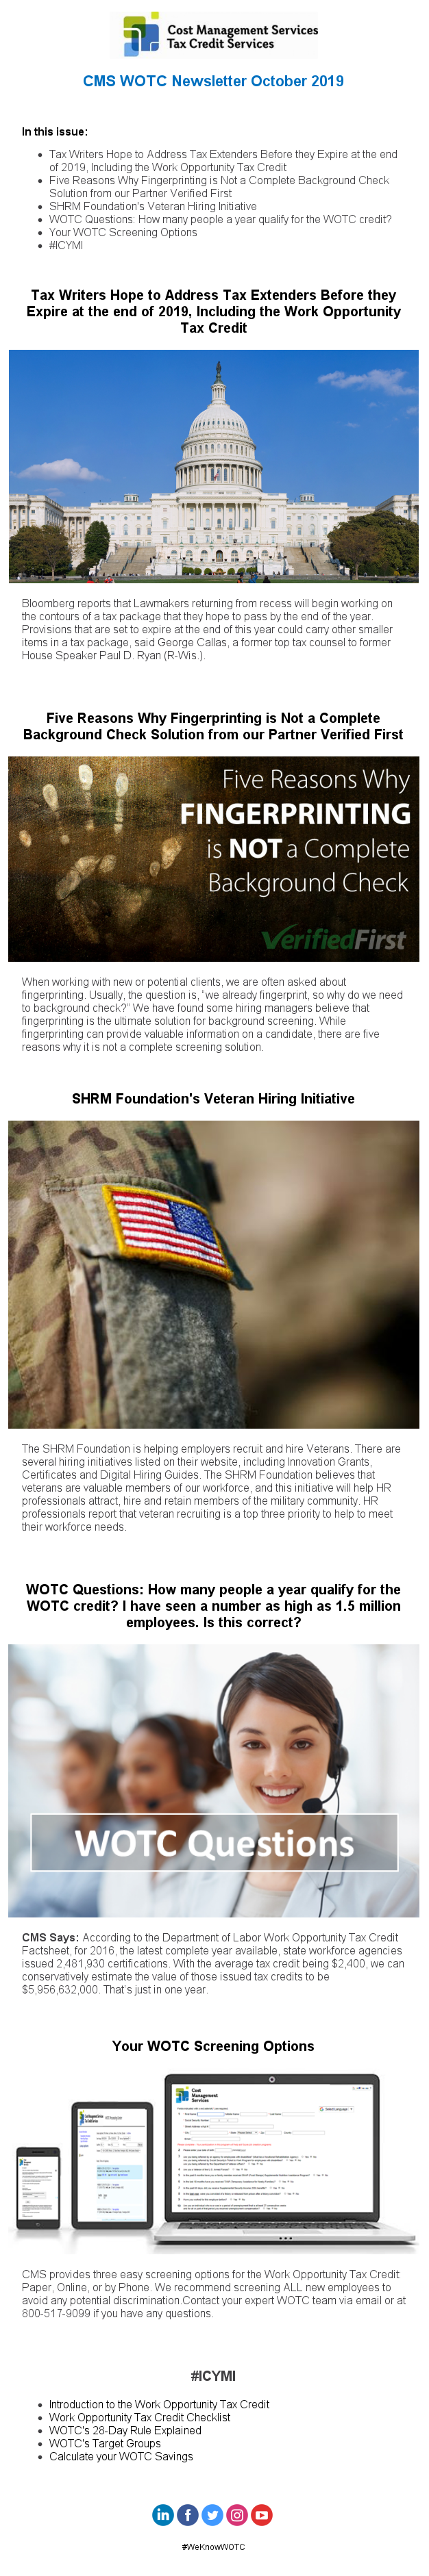 WOTC Newsletter October 2019 Customers